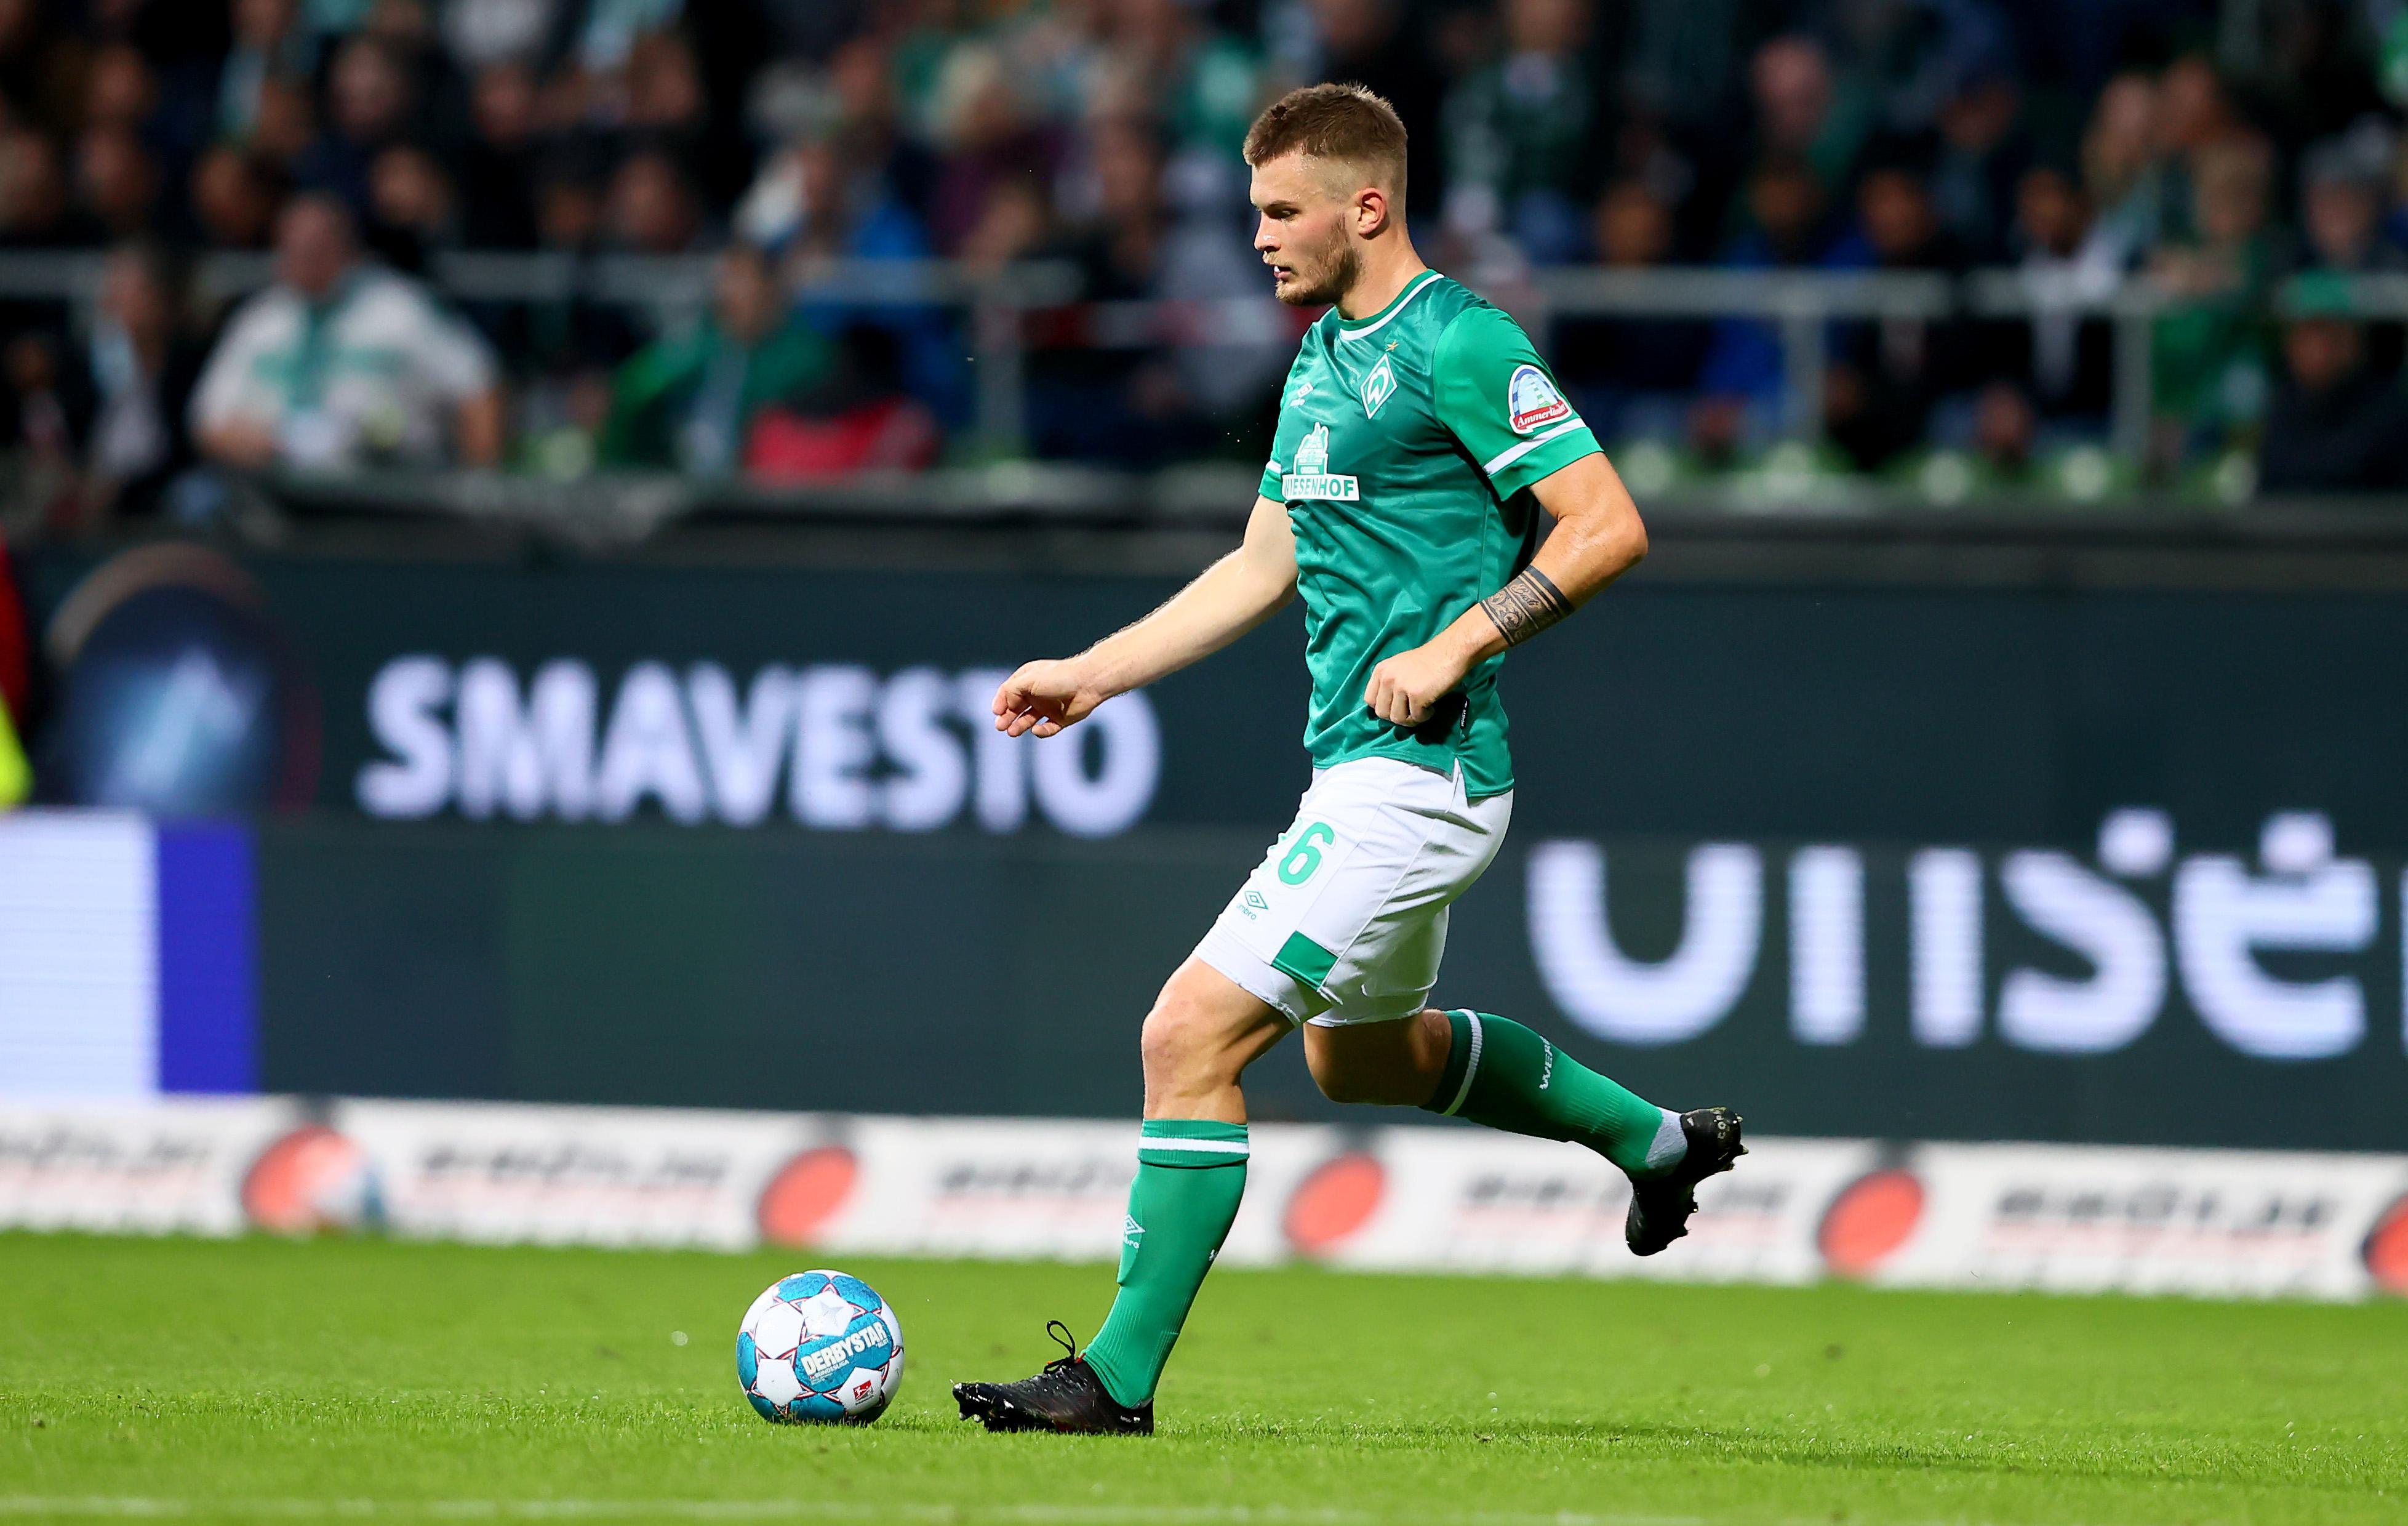 SV Werder Bremen v 1. FC Heidenheim 1846 - Second Bundesliga